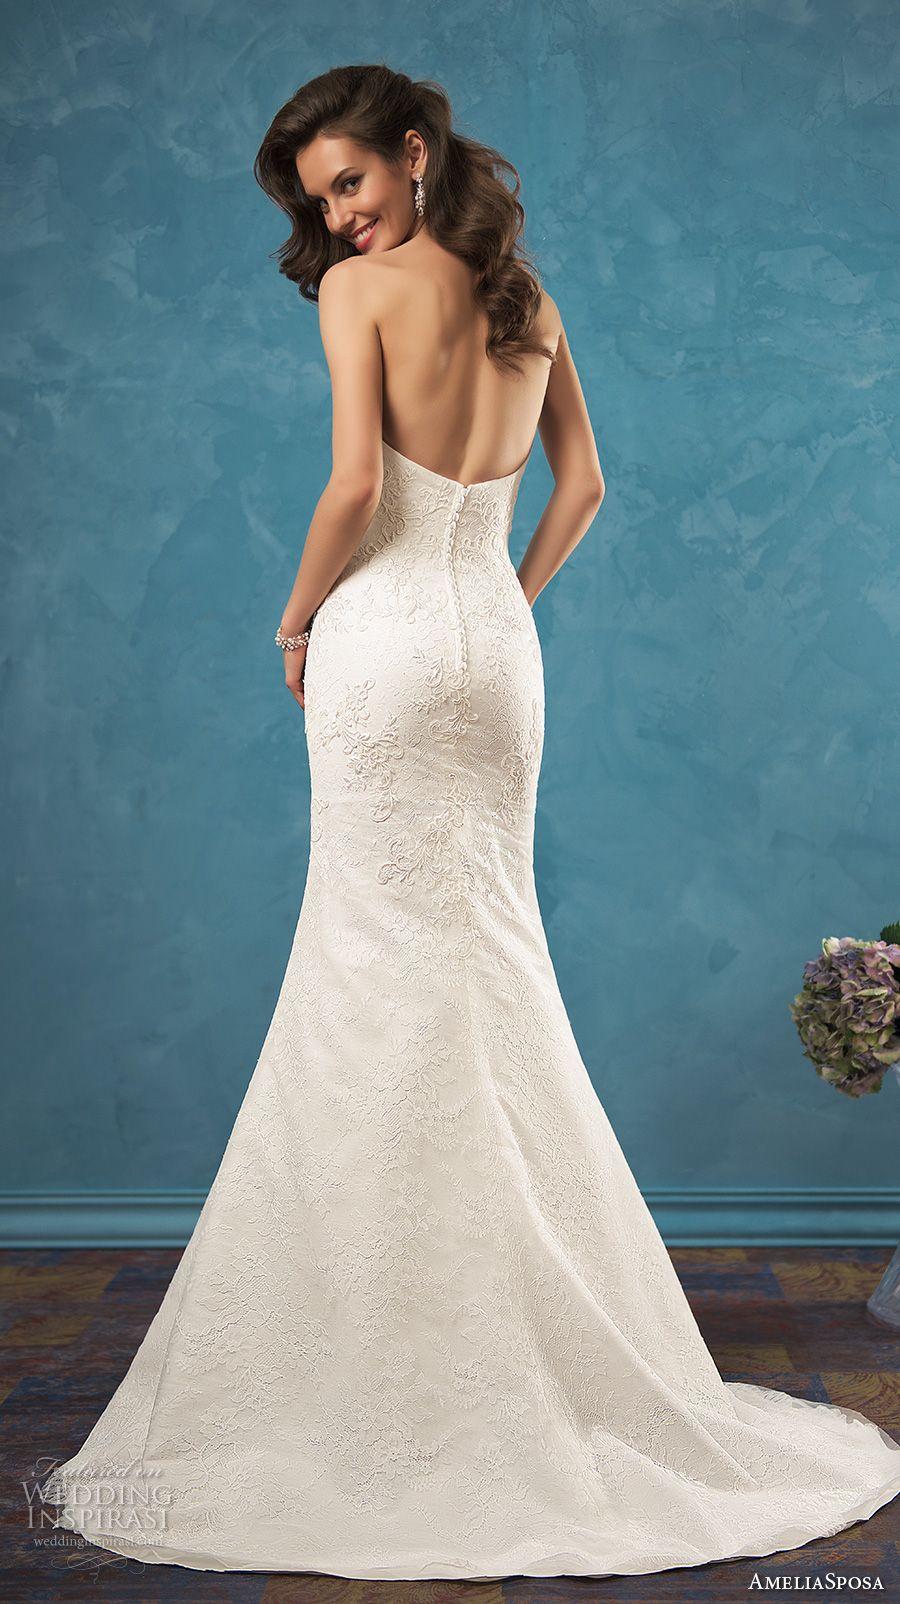 Amelia Sposa 2017 Wedding Dresses | Amelia sposa, Amelia and Wedding ...